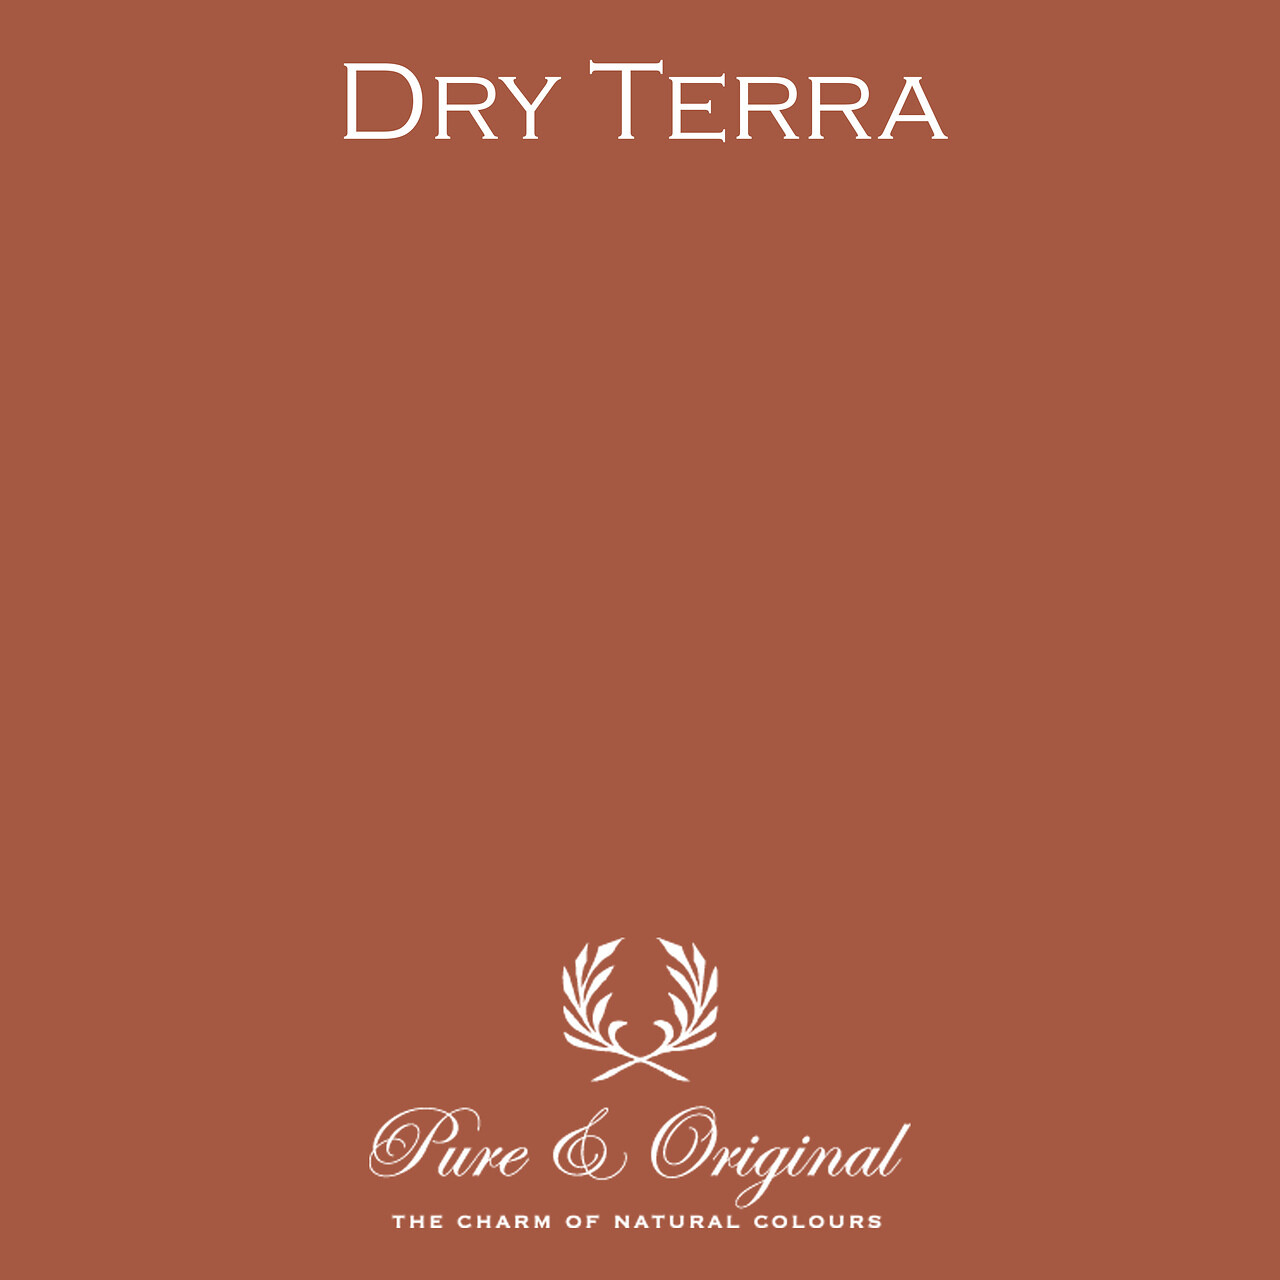 Dry Terra Marrakech